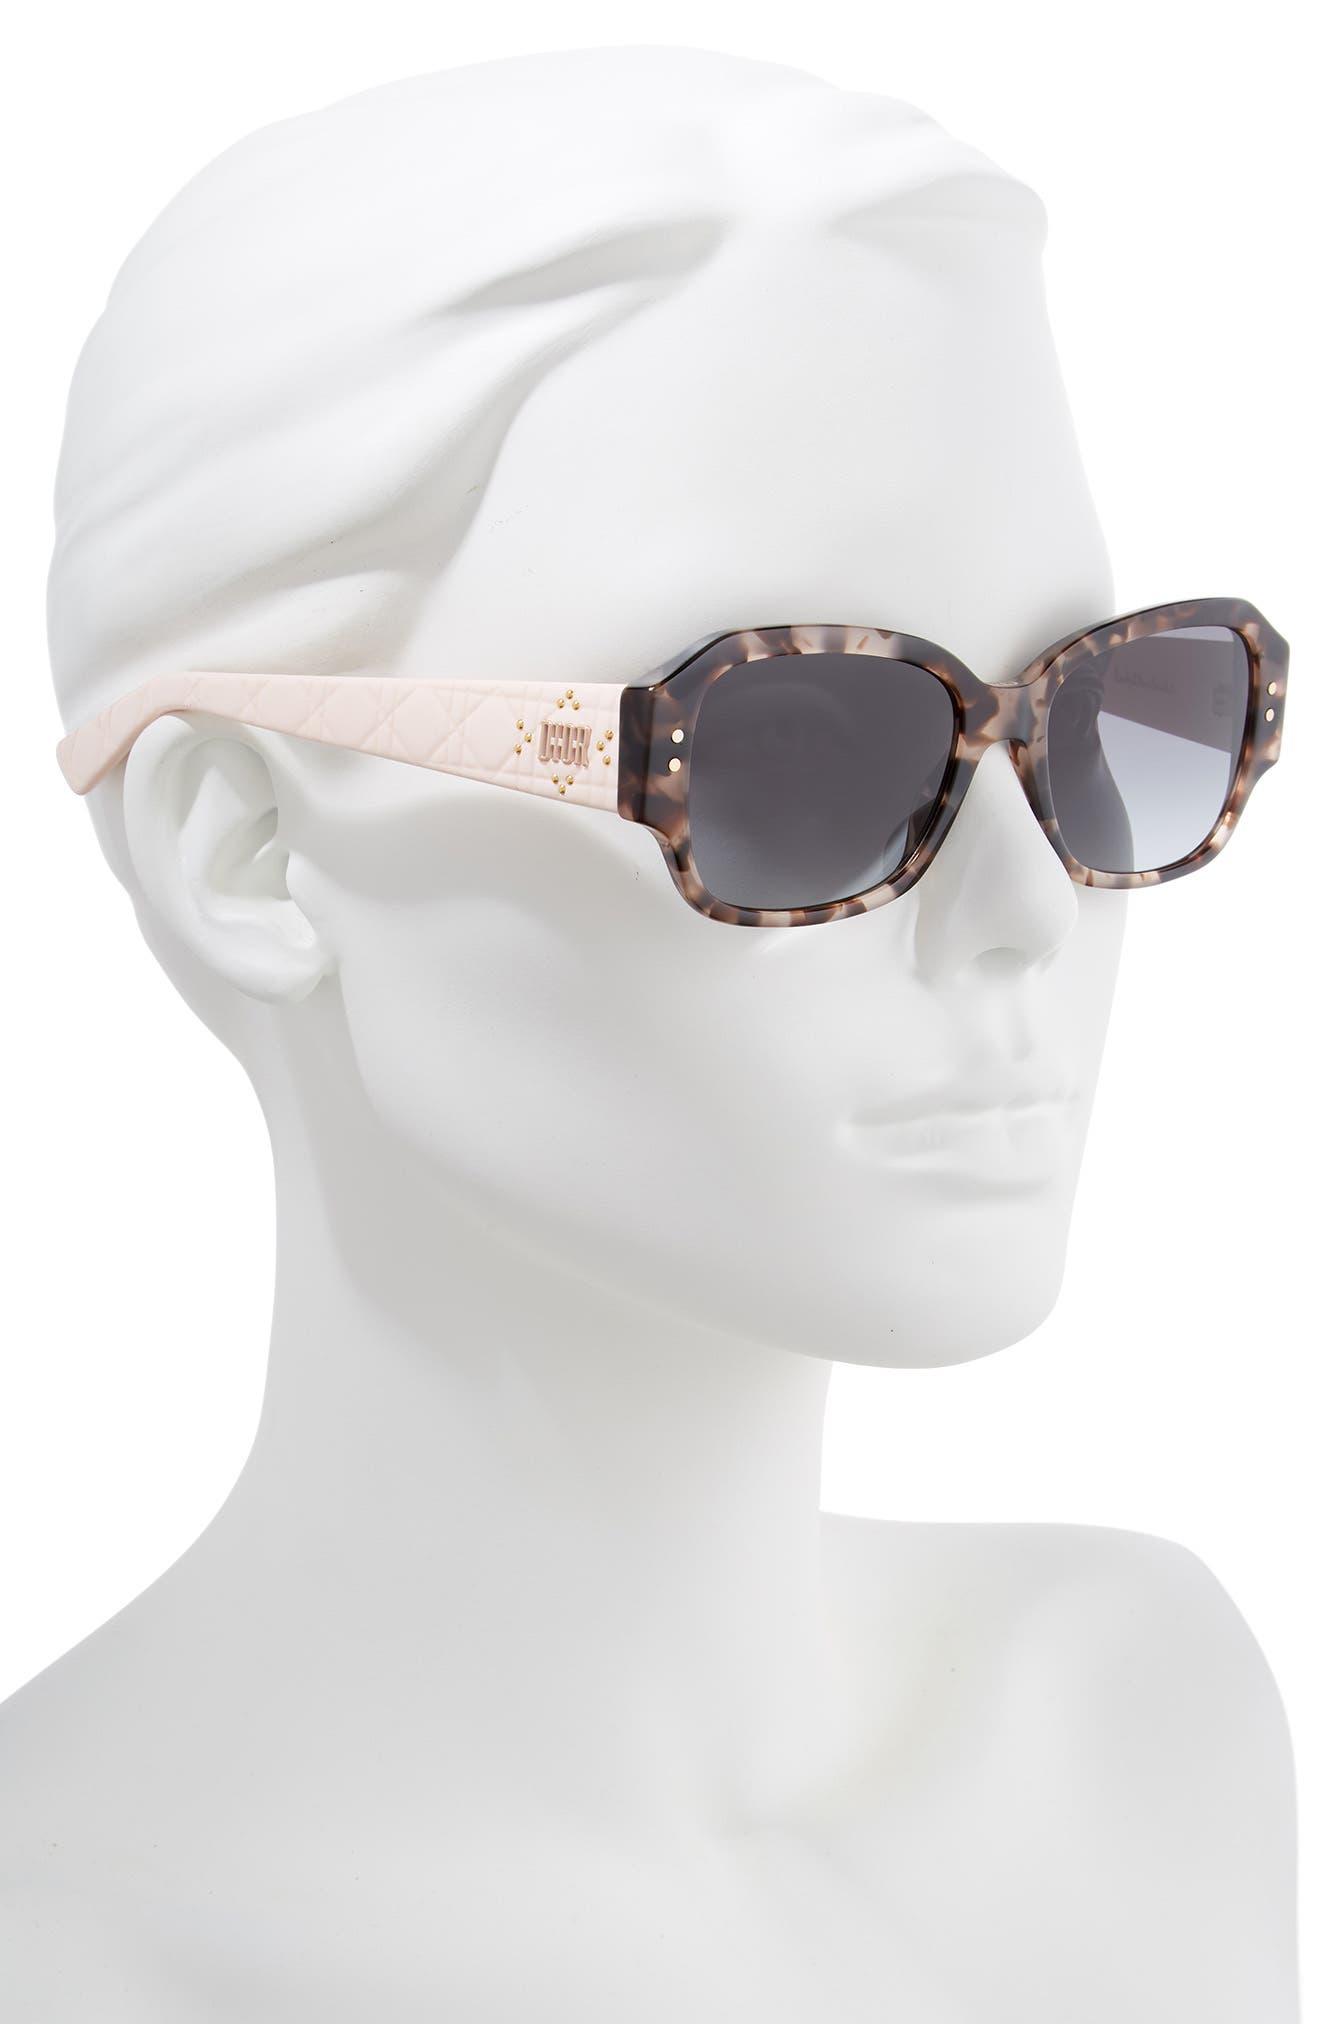 Ladydiorstuds5 54mm Sunglasses,                             Alternate thumbnail 2, color,                             HAVANA LIGHT PINK